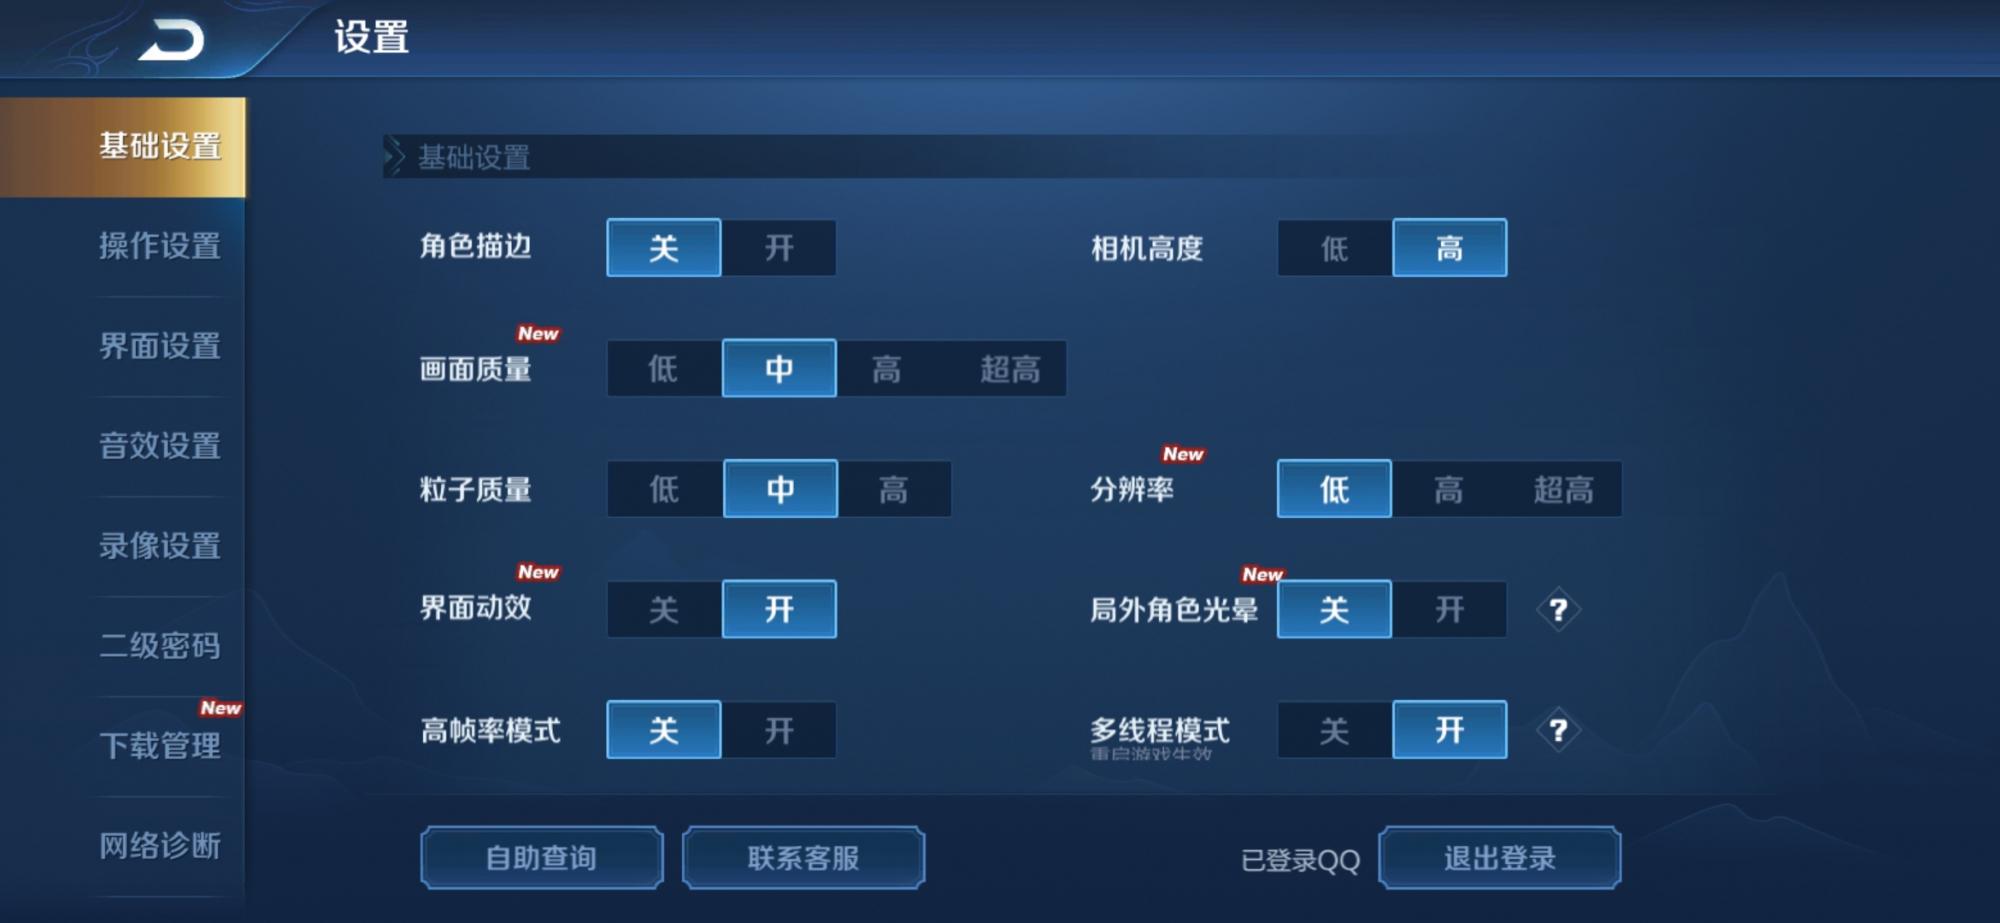 Screenshot_20190615_113523_com.tencent.tmgp.sgame.jpg